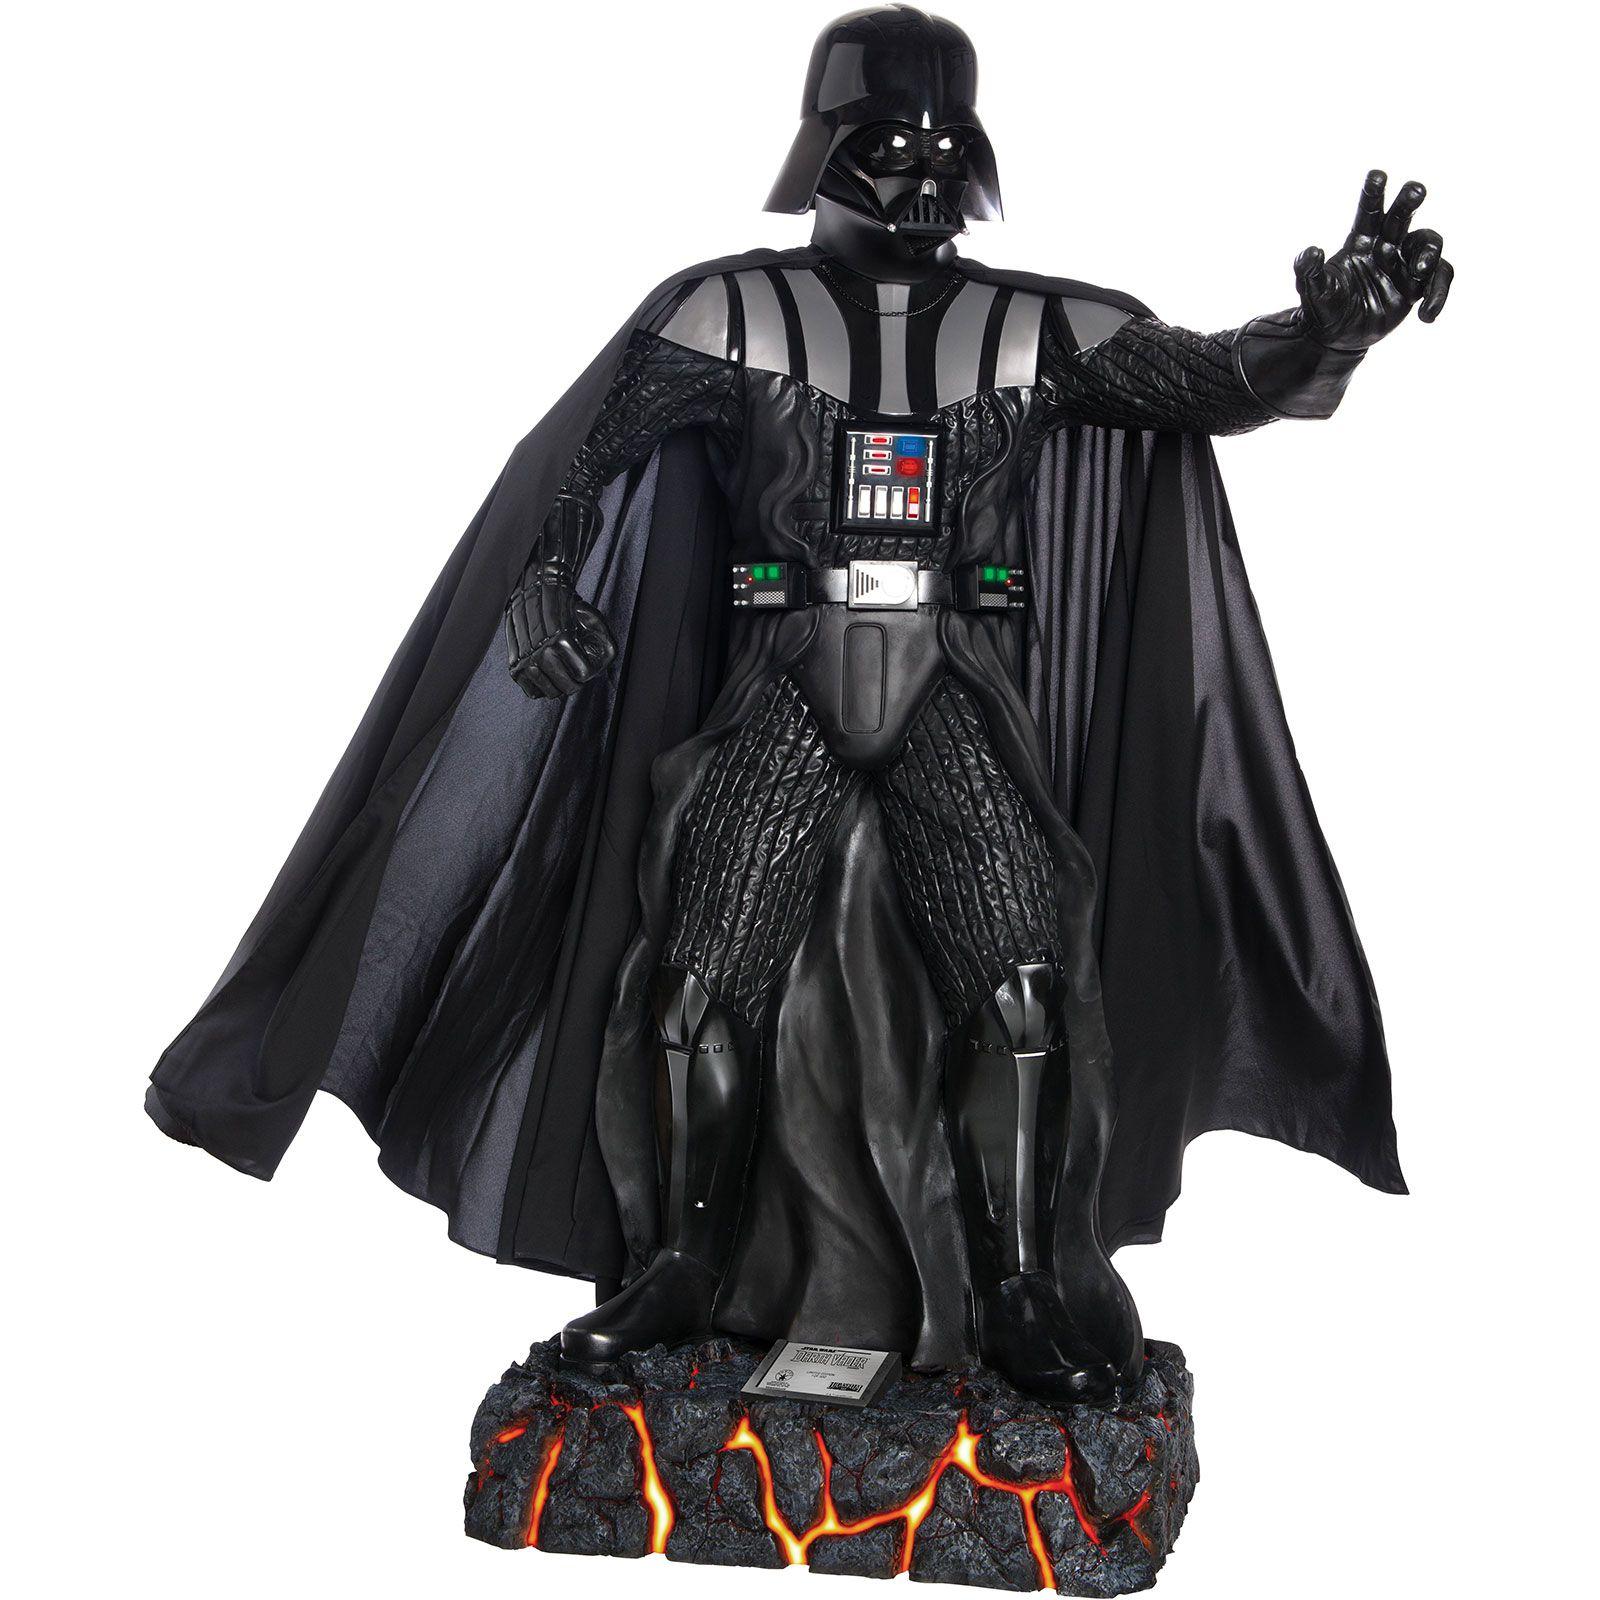 PRÉ VENDA Estátua Darth Vader: Star Wars - Collector's Edition by  Rubie's (Tamanho Real) - Dynamite Entertainment